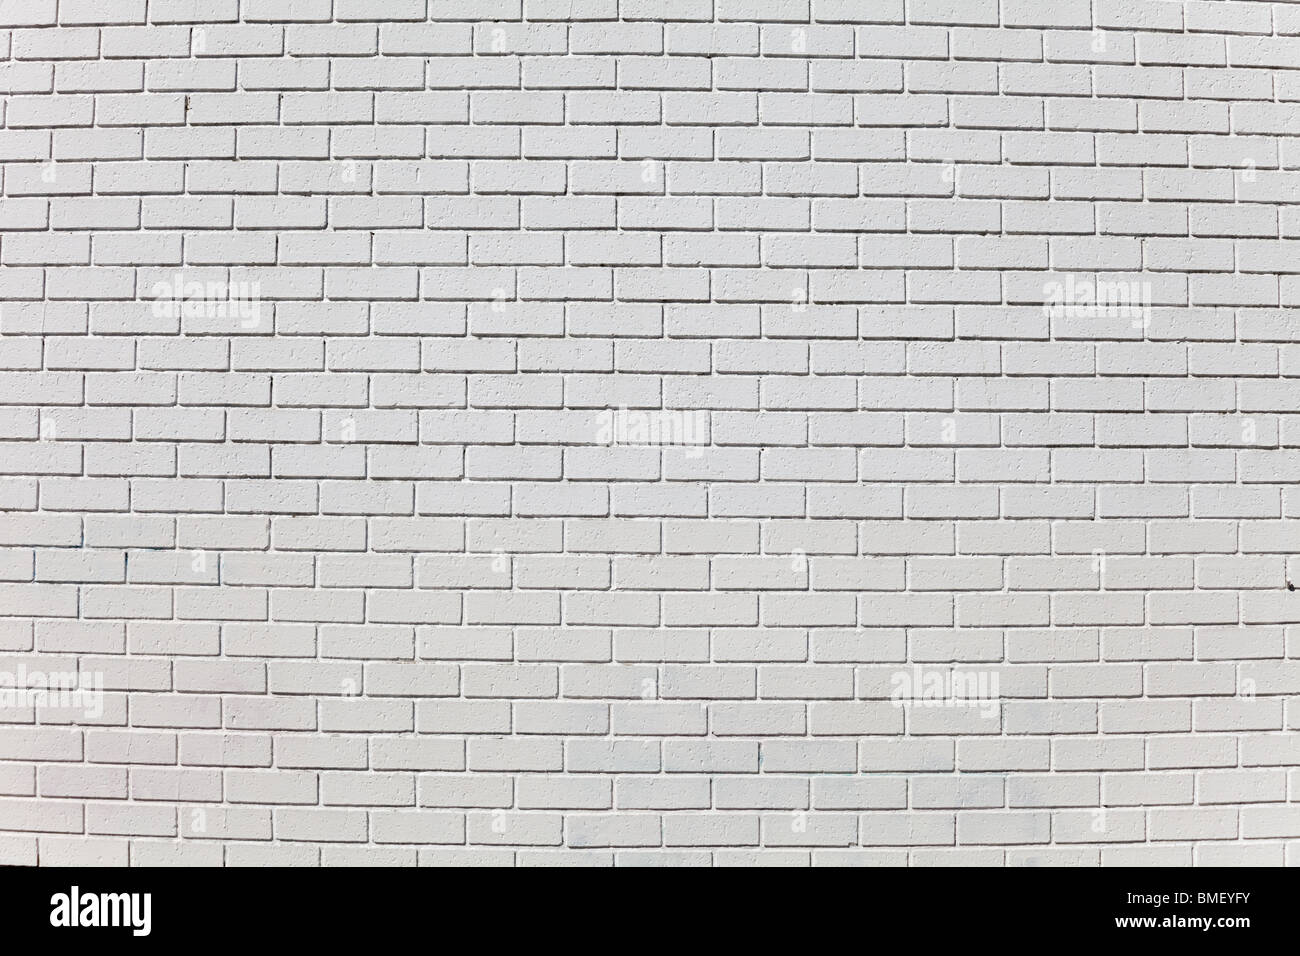 Pared de ladrillo blanco de fondo Imagen De Stock